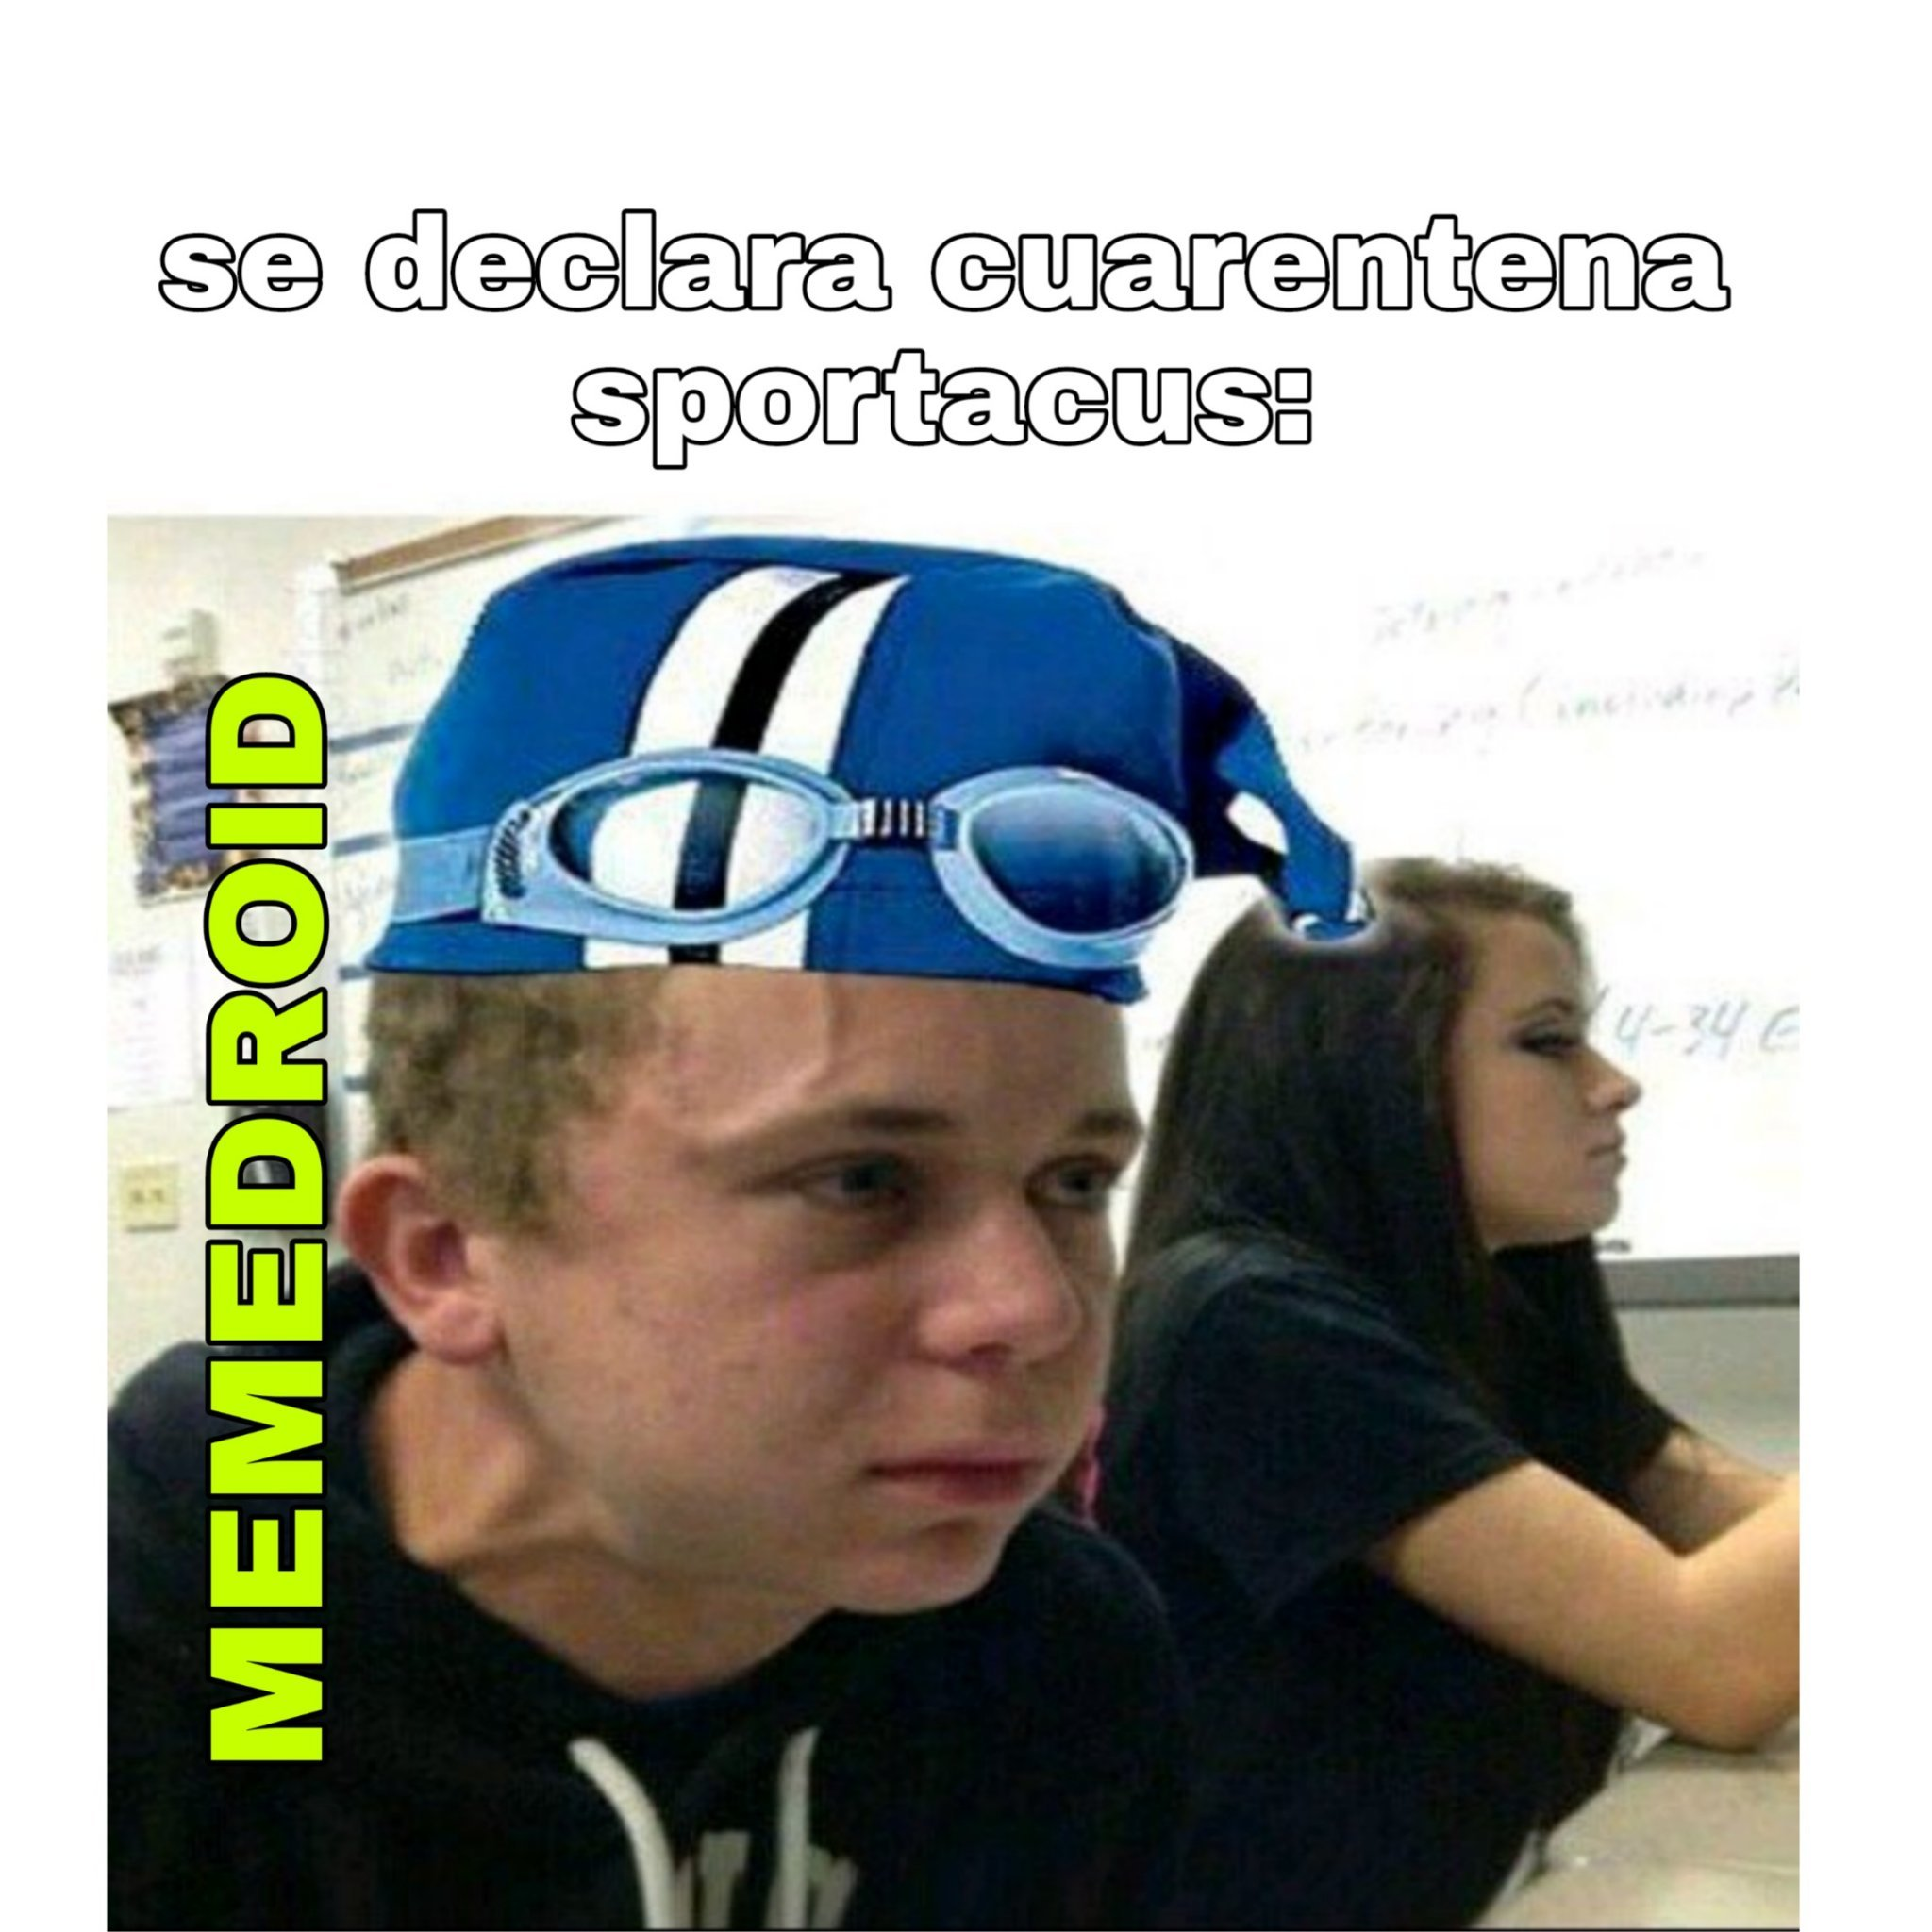 F por sportacus - meme